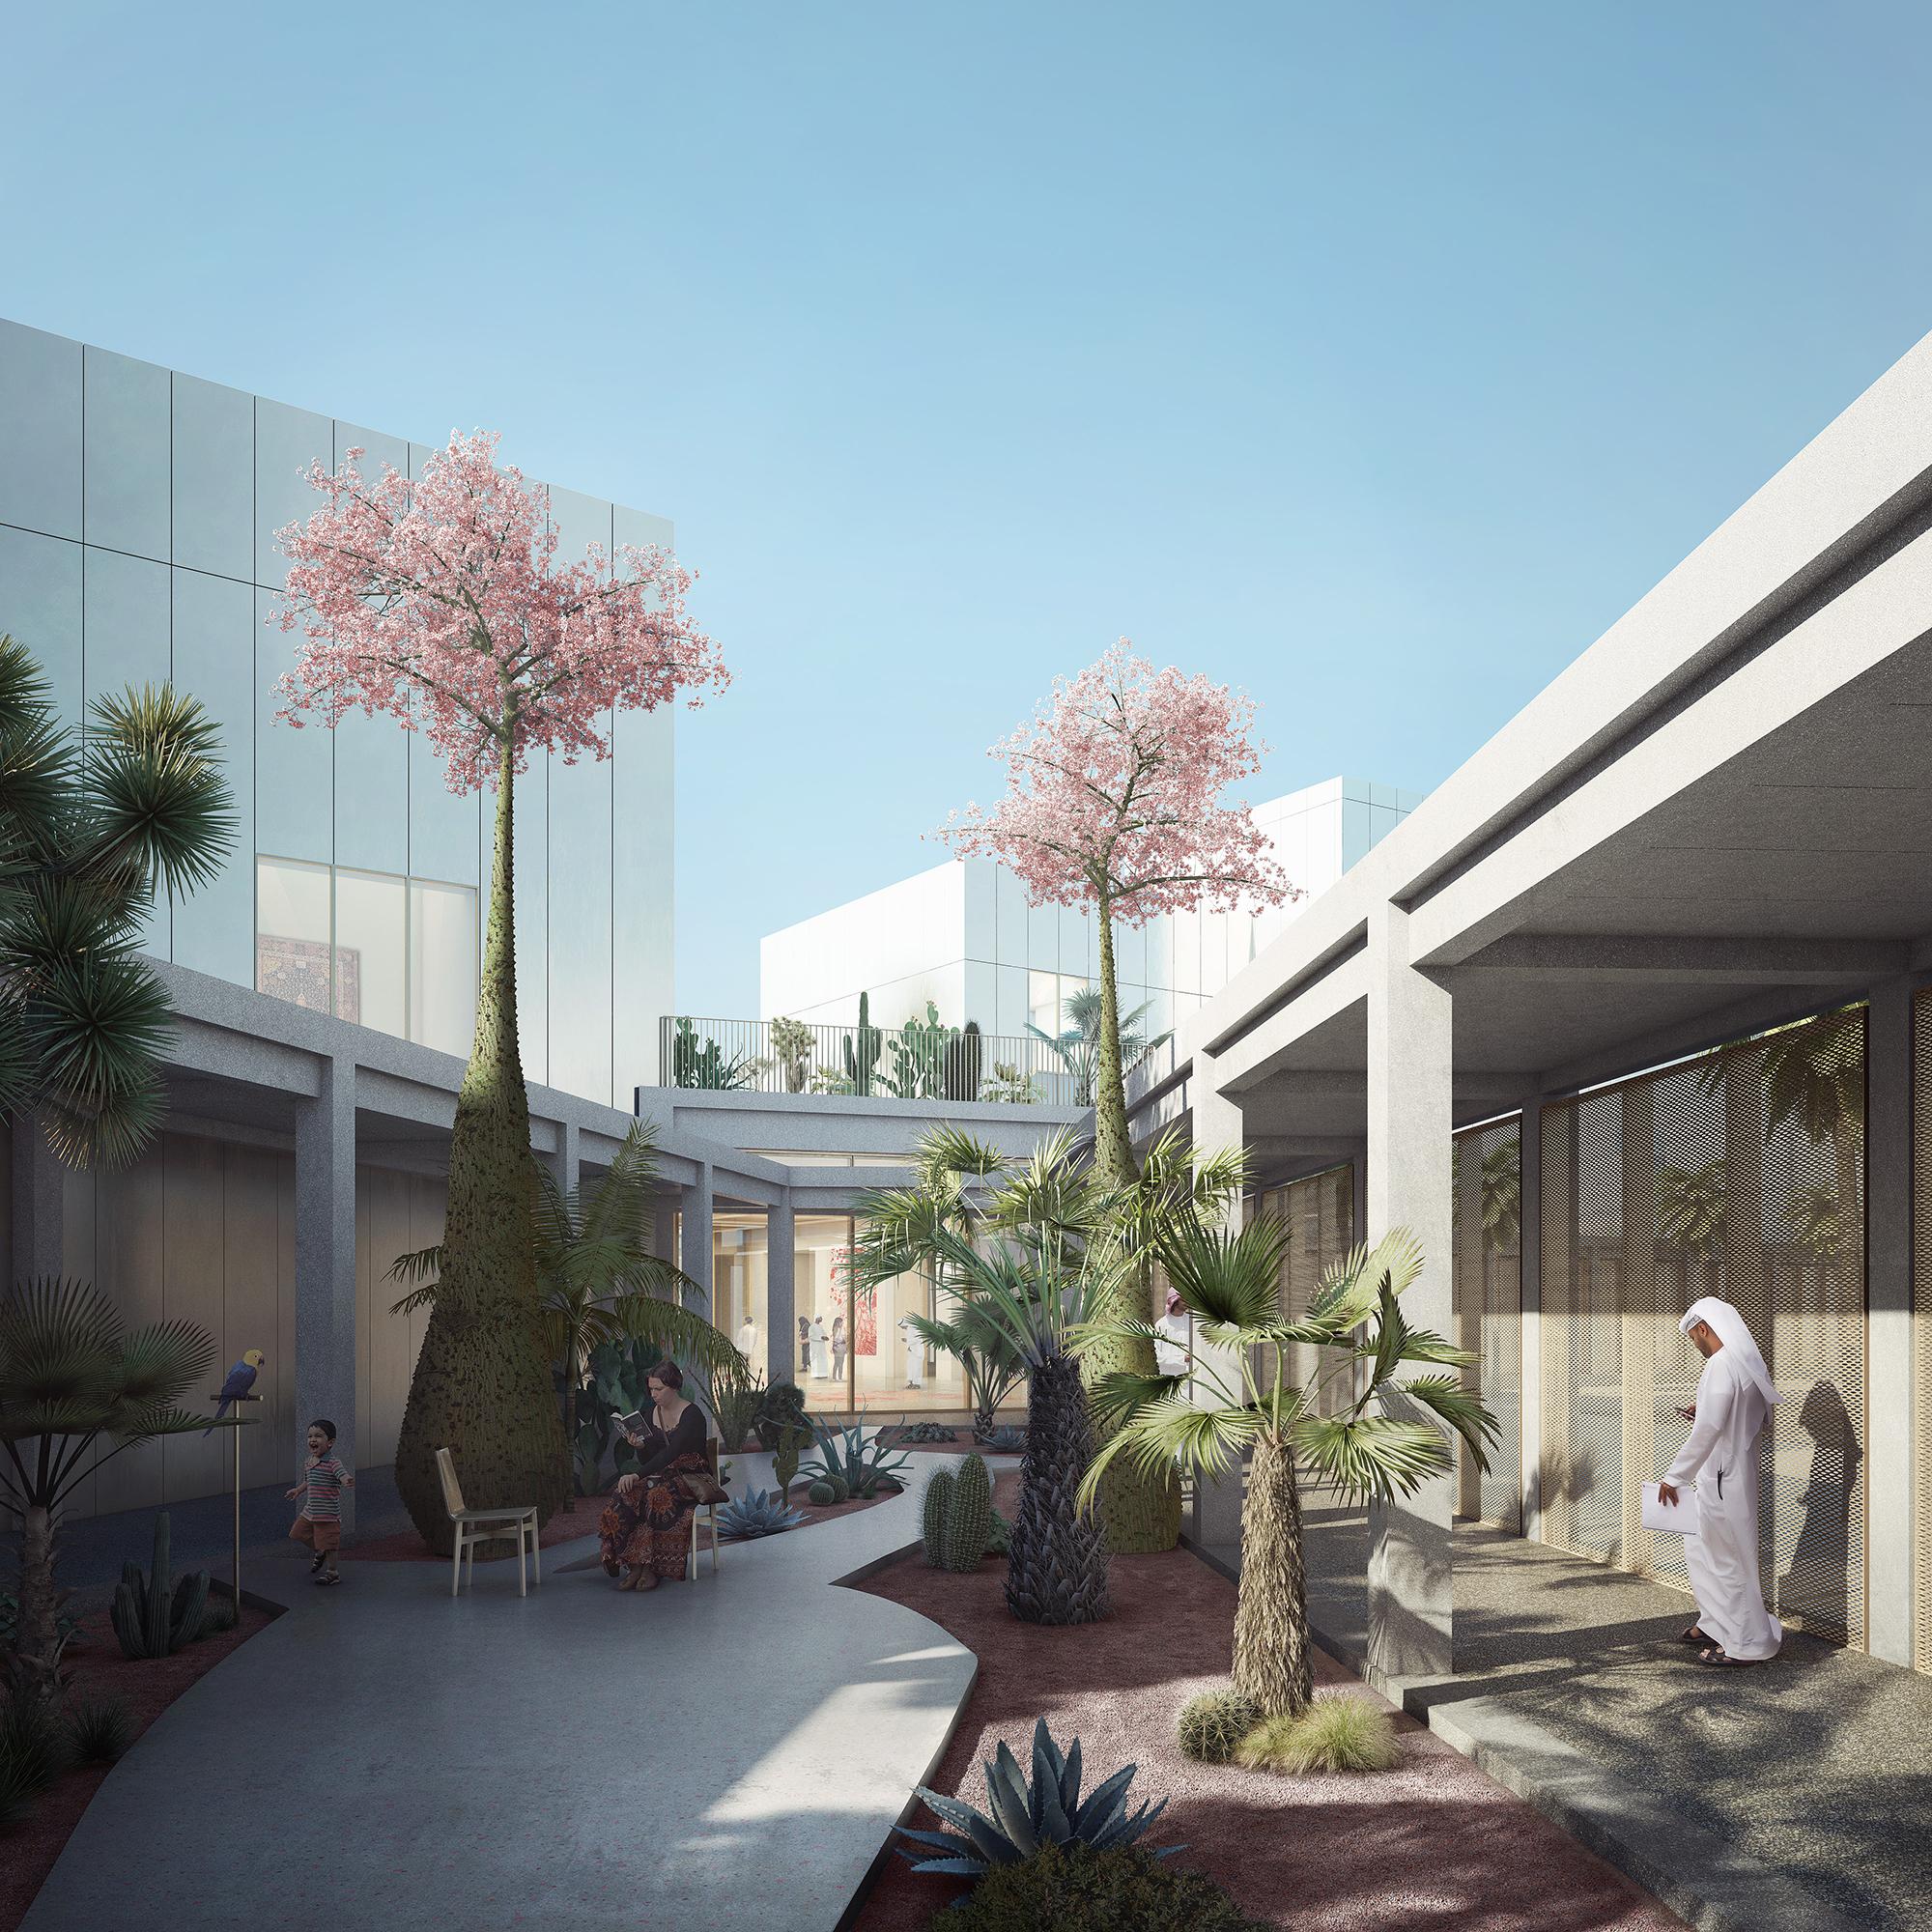 Top Interior Design Firm In Dubai: Art Jameel Reveals Design For Arts Facility In Dubai By